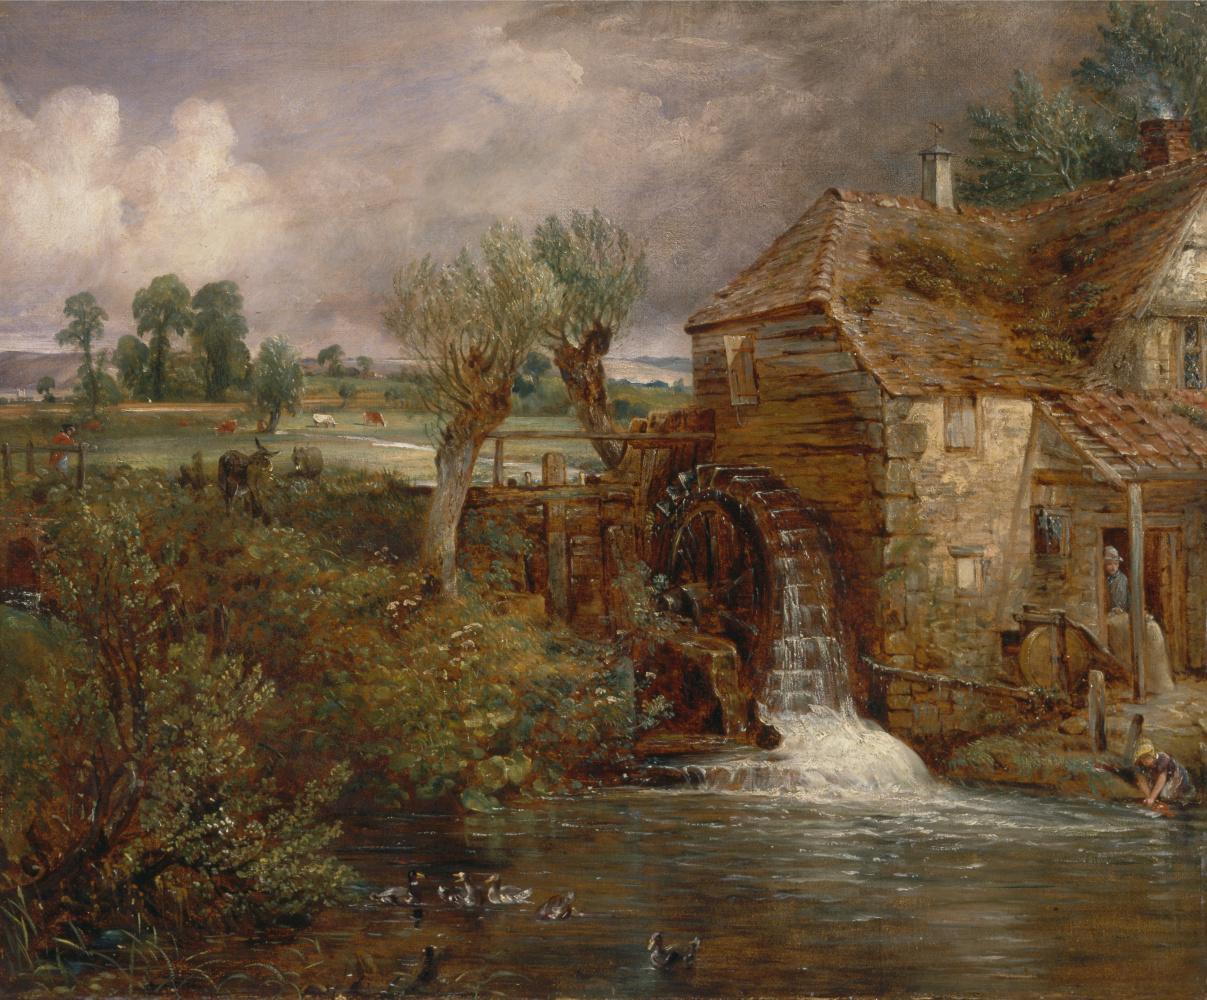 John Constable. Water mill, Gillingham